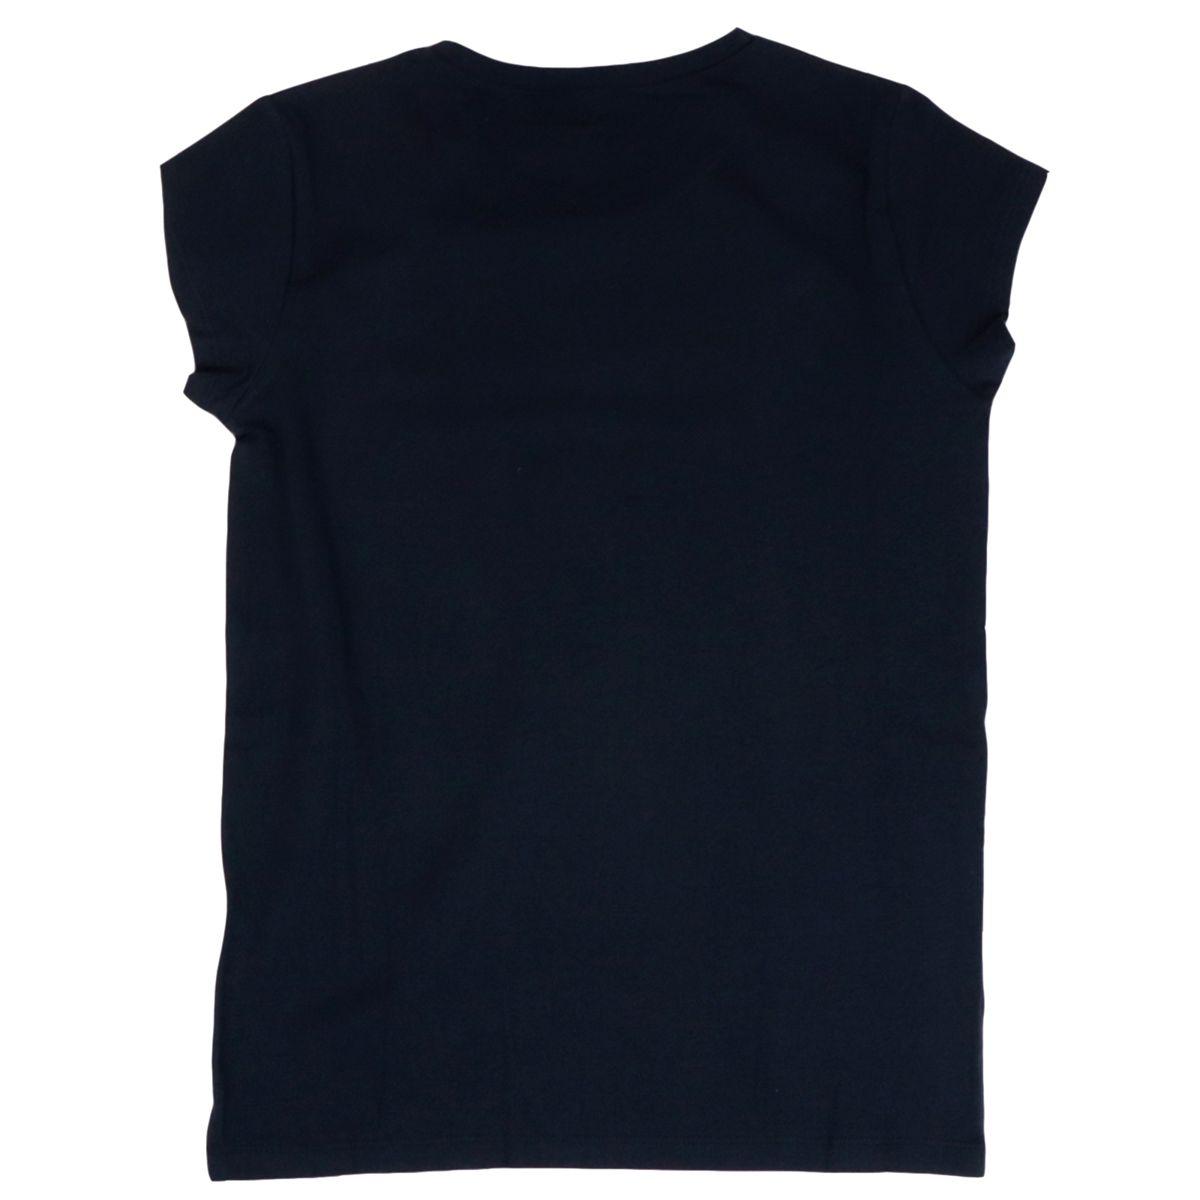 Short-sleeved T-shirt in cotton jersey with rhinestone logo. Blue / gold Liu Jo